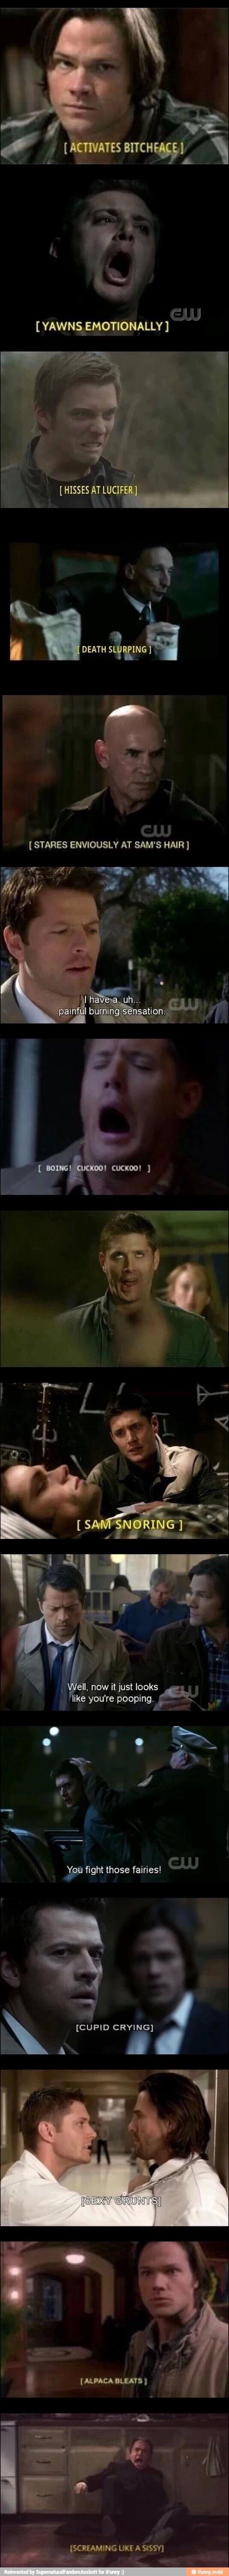 They forgot *Dean randomly dies in shower*